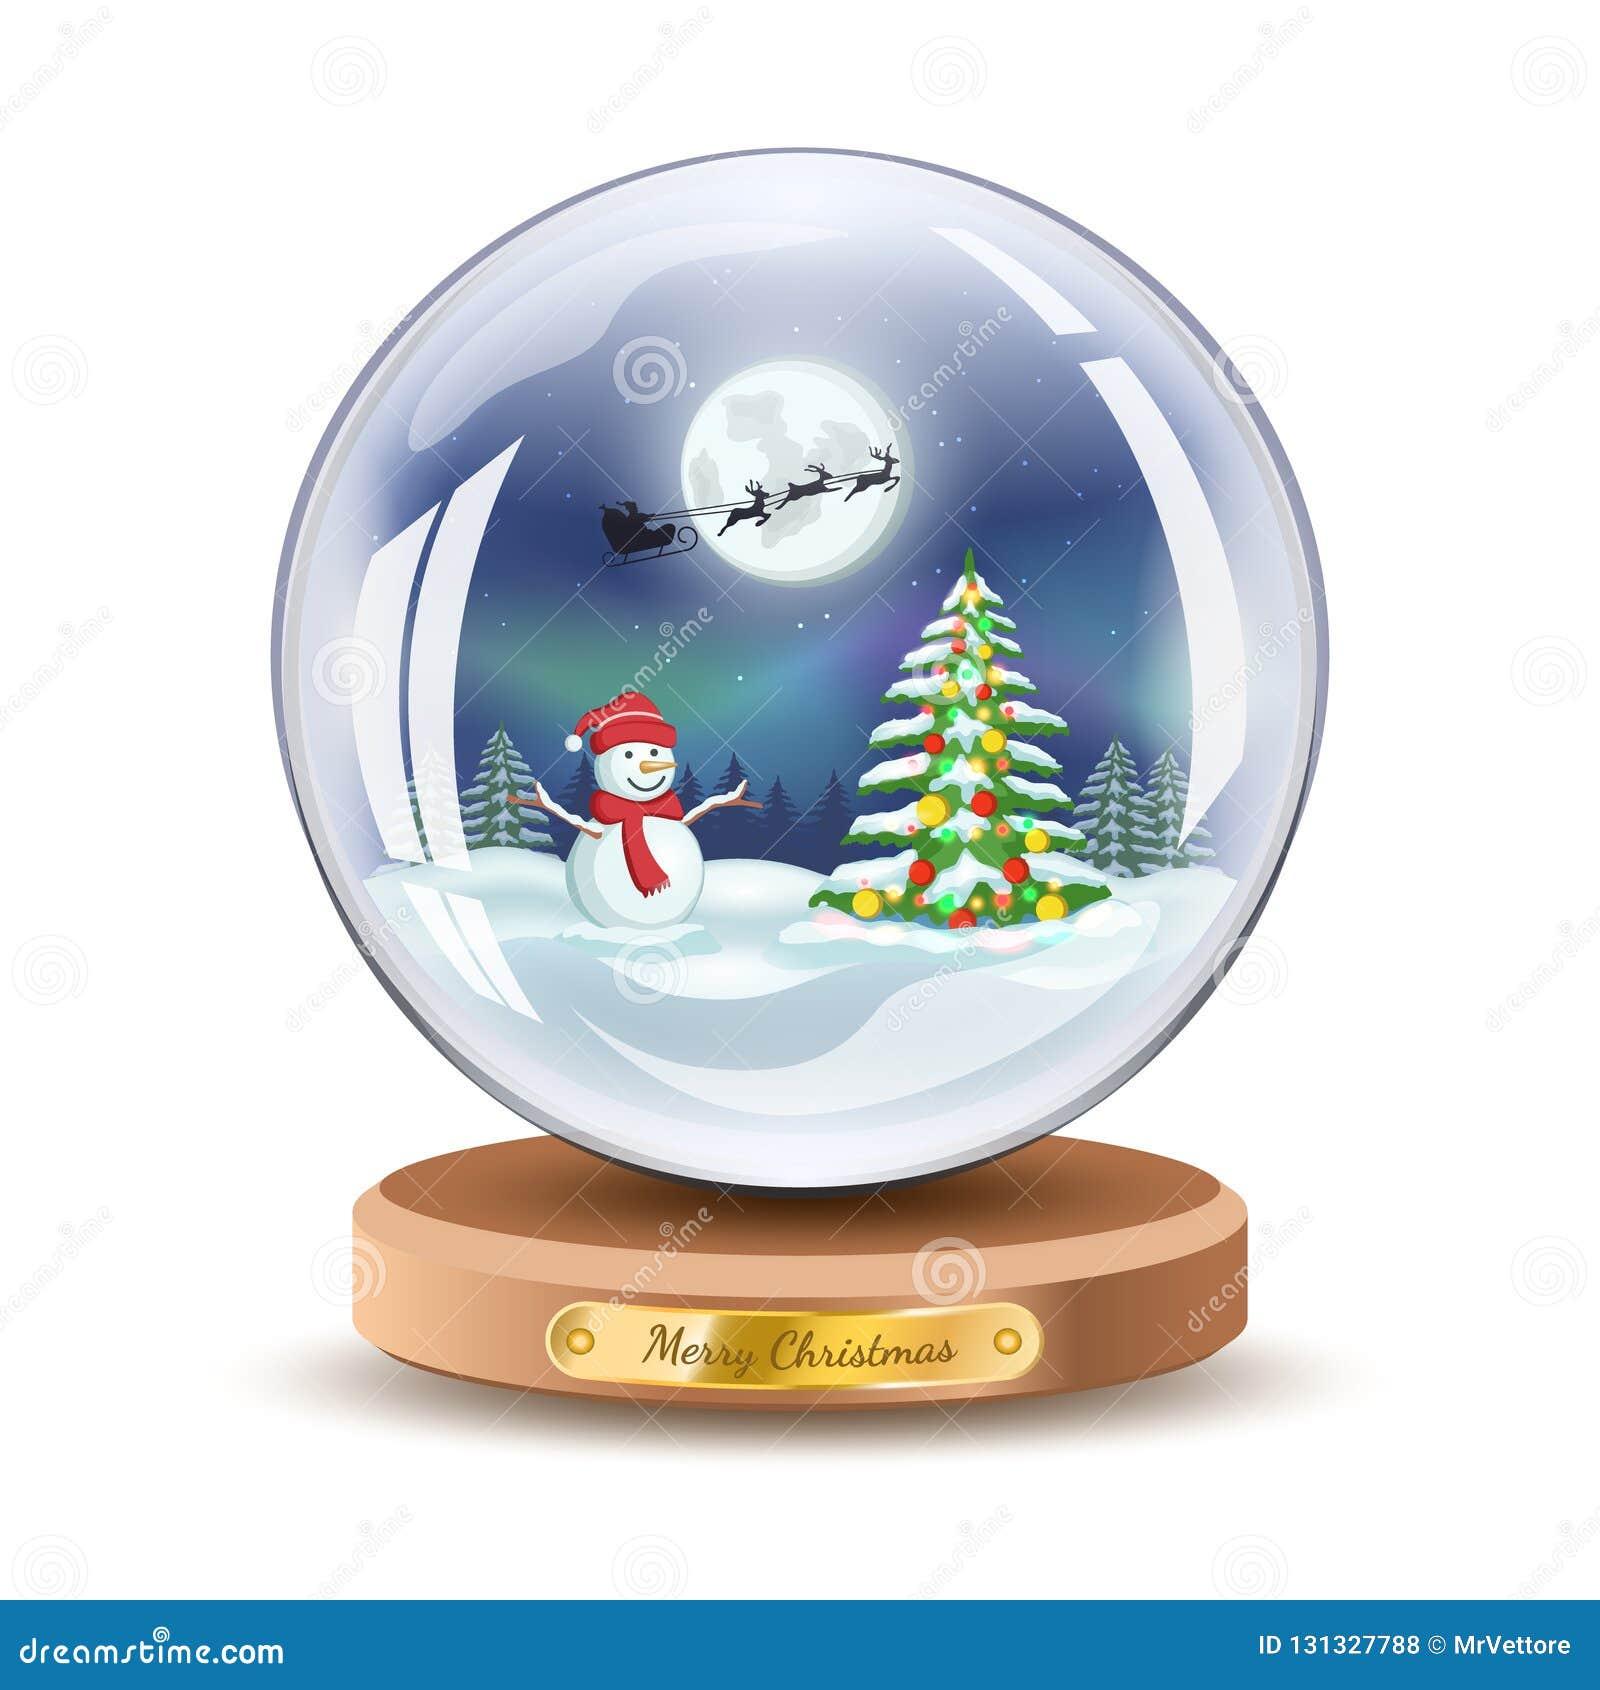 Christmas snow globe and snowman Vector Xmas gift glass ball illustration.